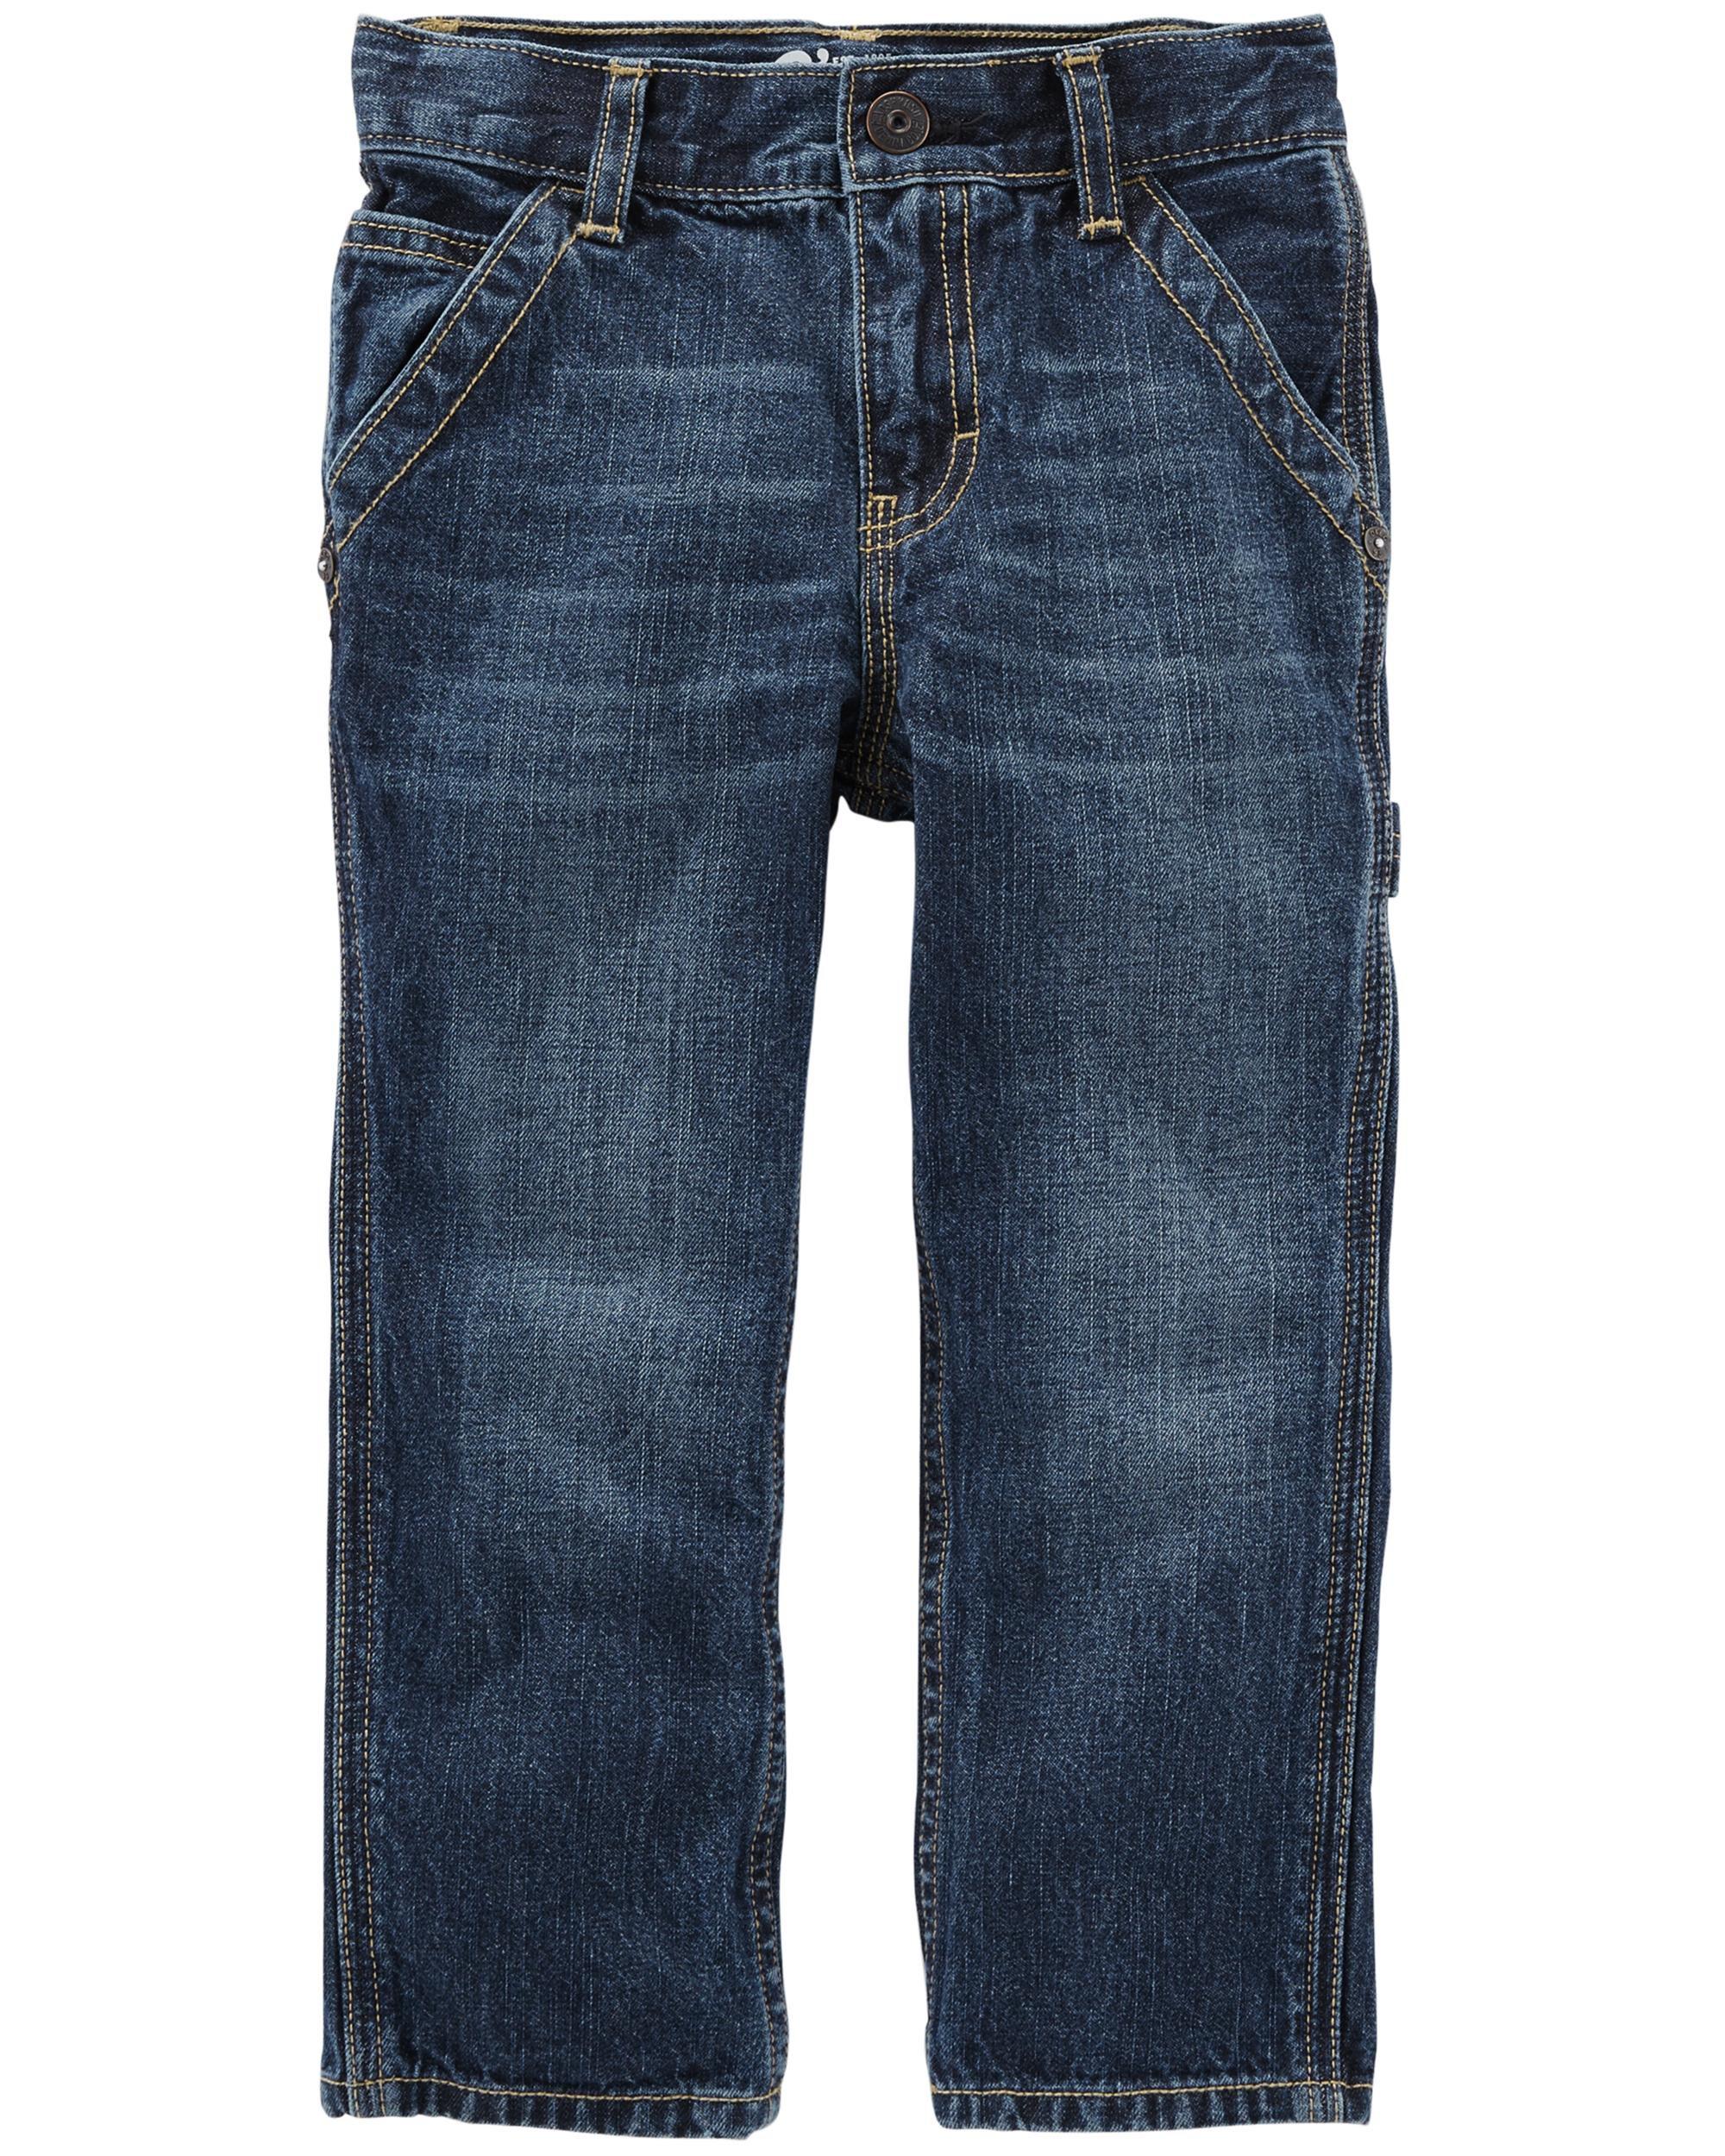 Workwear Straight Jeans - Vintage Blue